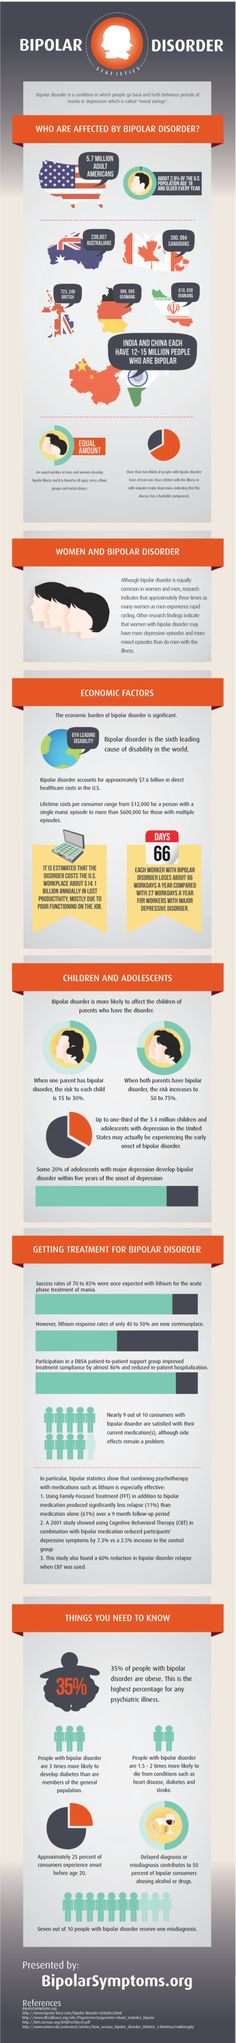 Bipolar disorder #infographic understanding mental illness #support